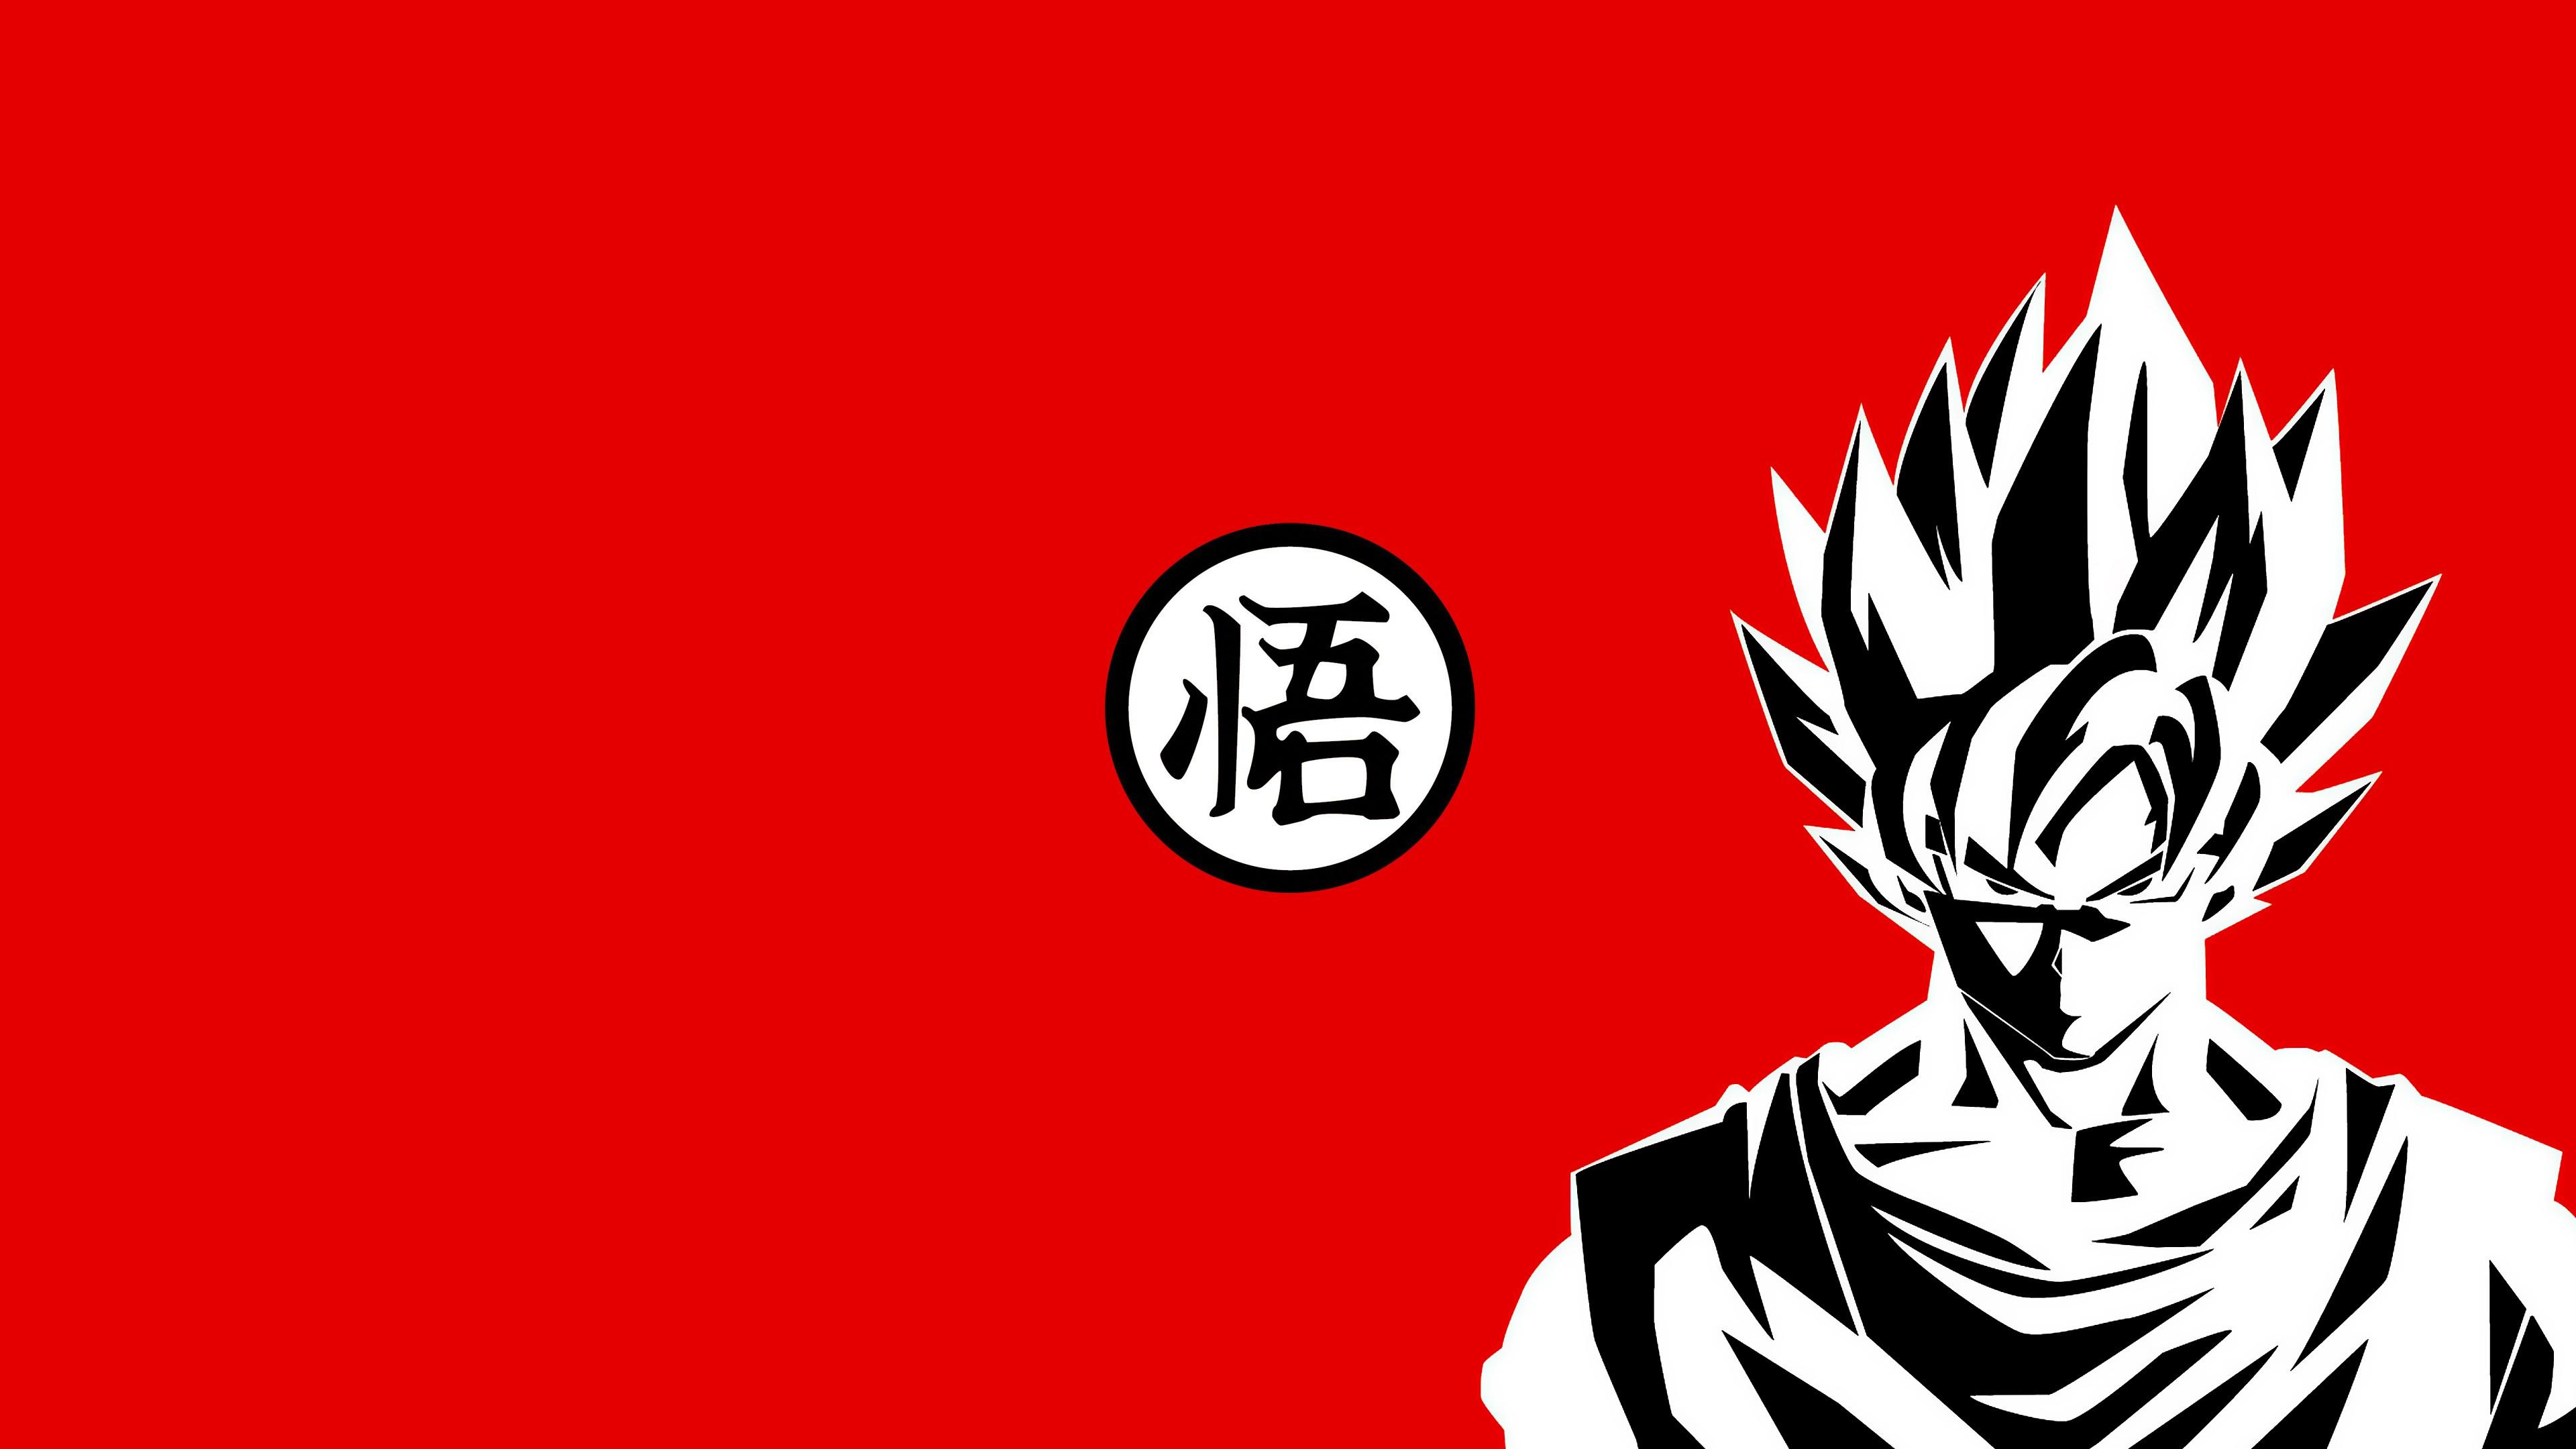 Fondos de pantalla ilustraci n monocromo rojo logo - Papel pintado rojo y blanco ...